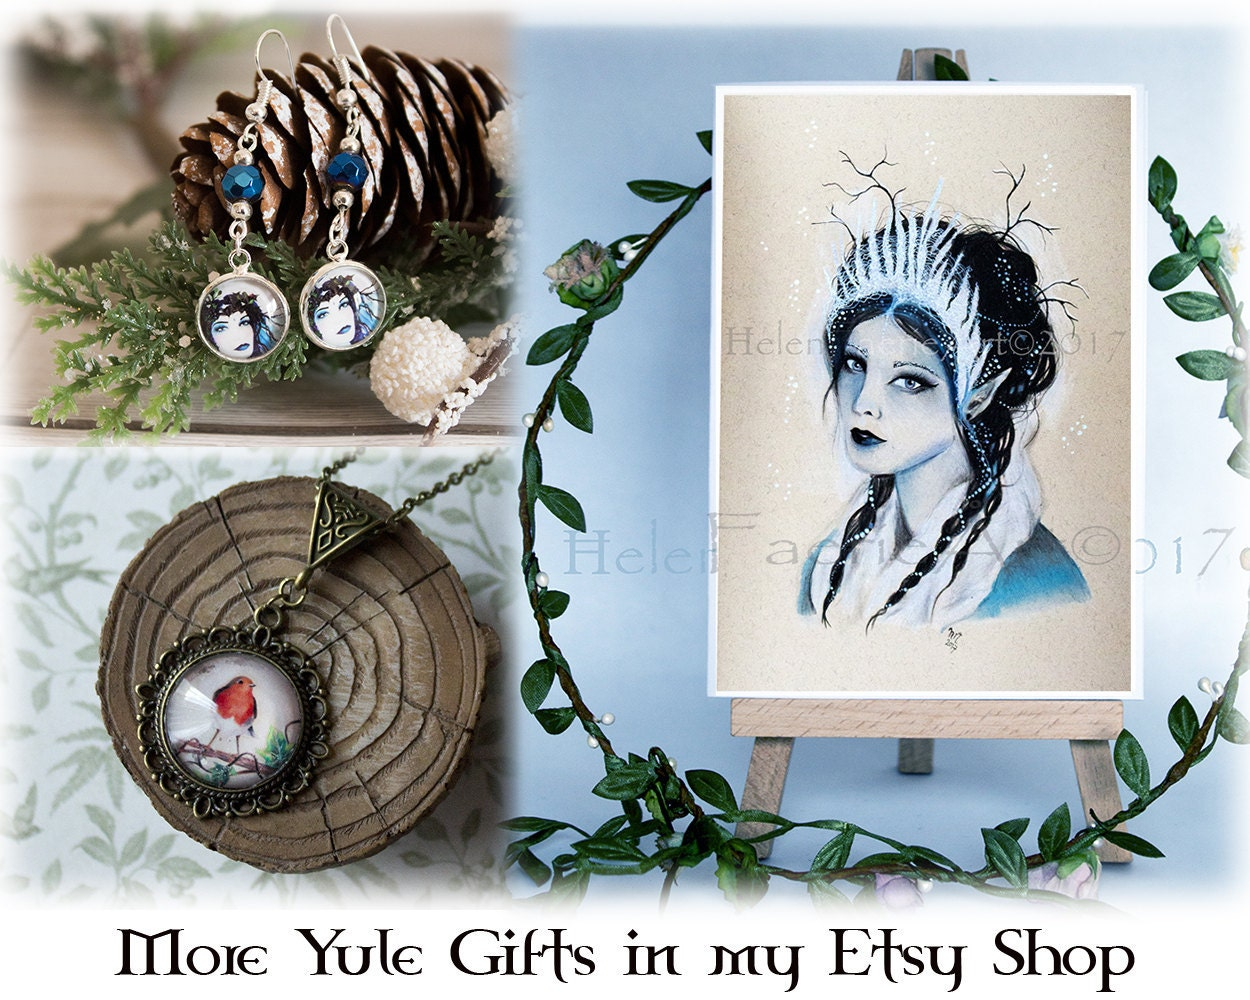 Yule Gifts